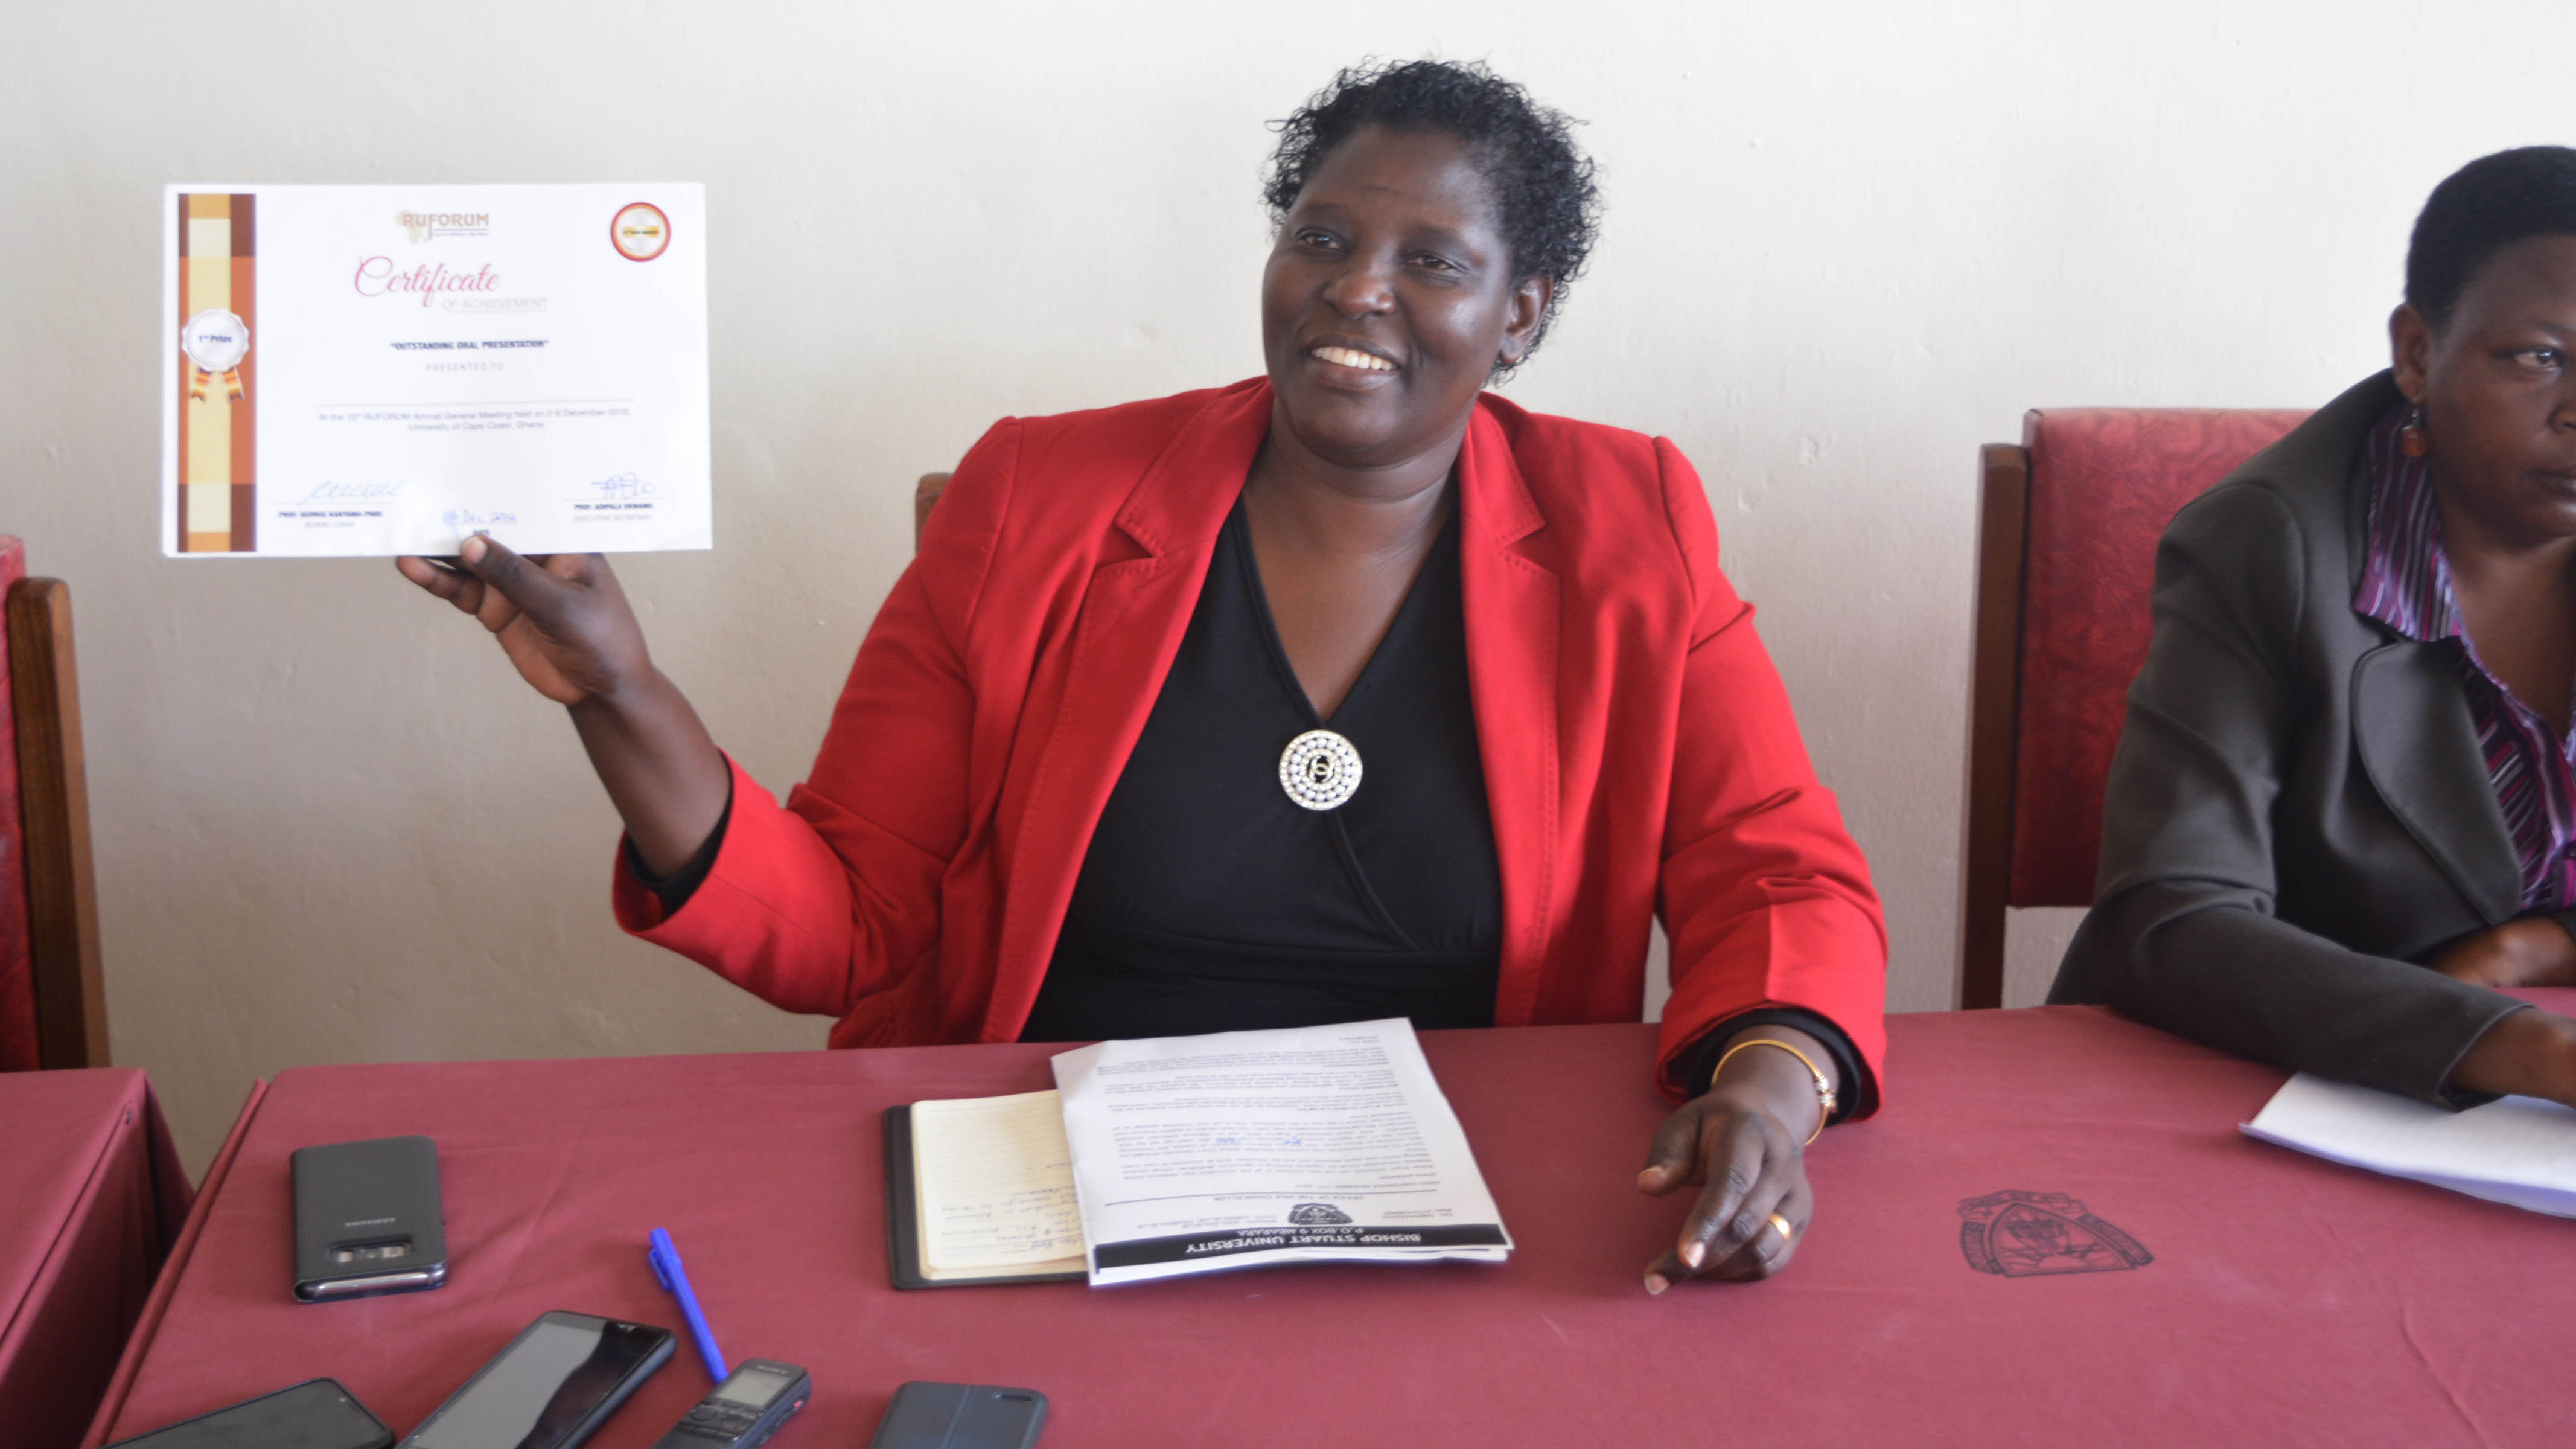 VC Prof. Maud Kamatenesi (PhD) showing a certificate of achievement presented to Bishop Stuart University by RUFORUM